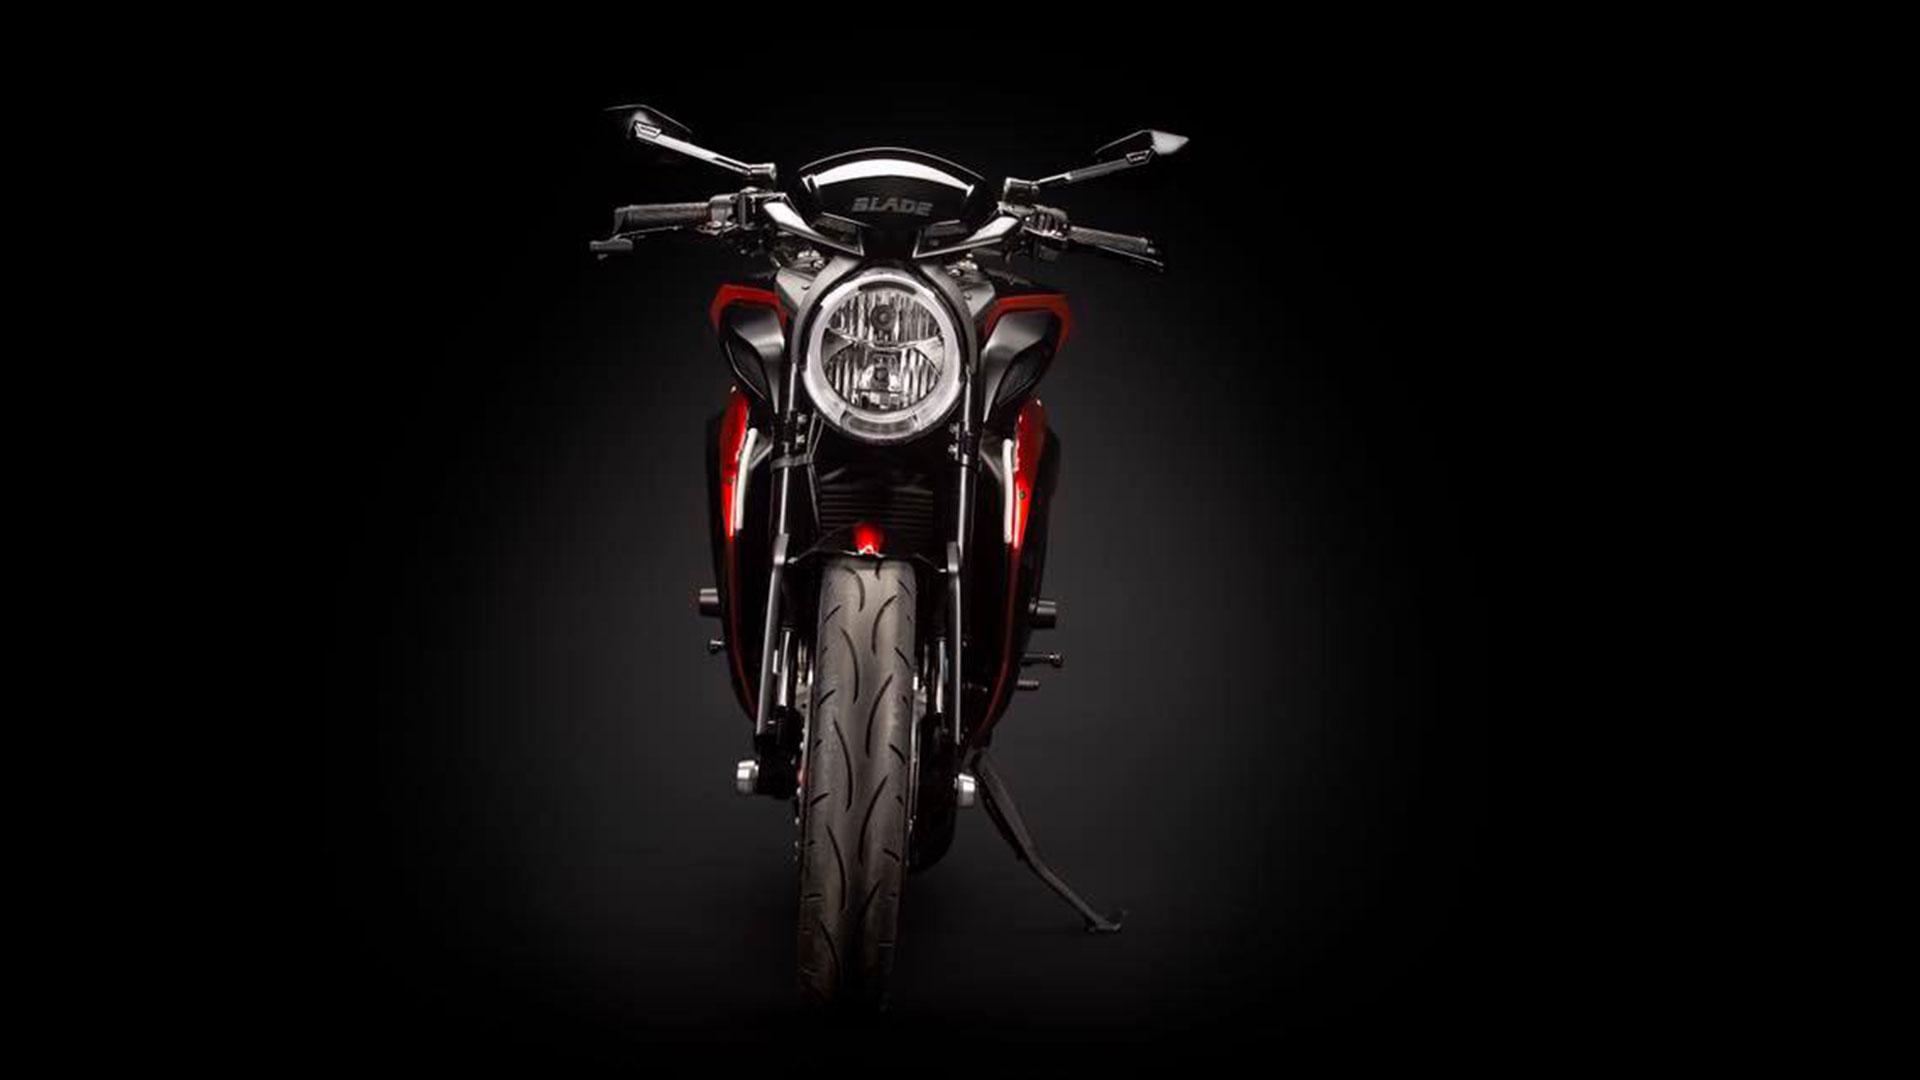 mv-agusta-dragster-800-blade-officine-gpdesign-3